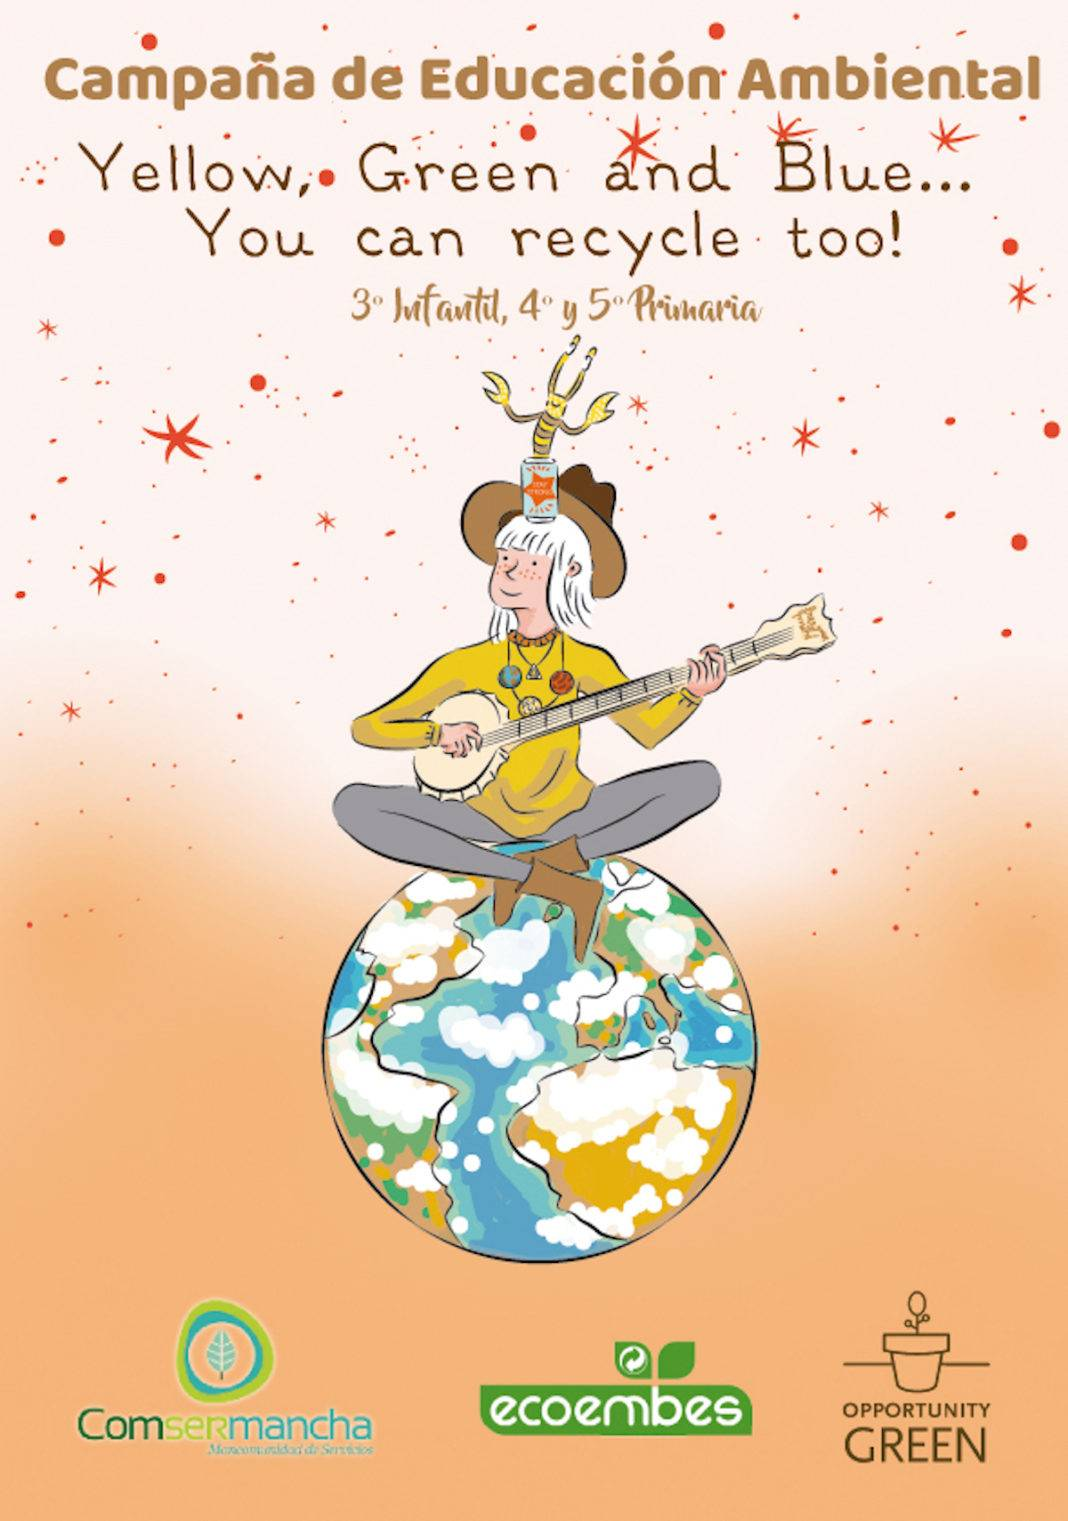 Campana Escolar reciclar en ingles Comsermancha 1068x1521 - Comsermancha iniciará una Campaña escolar de reciclaje en inglés